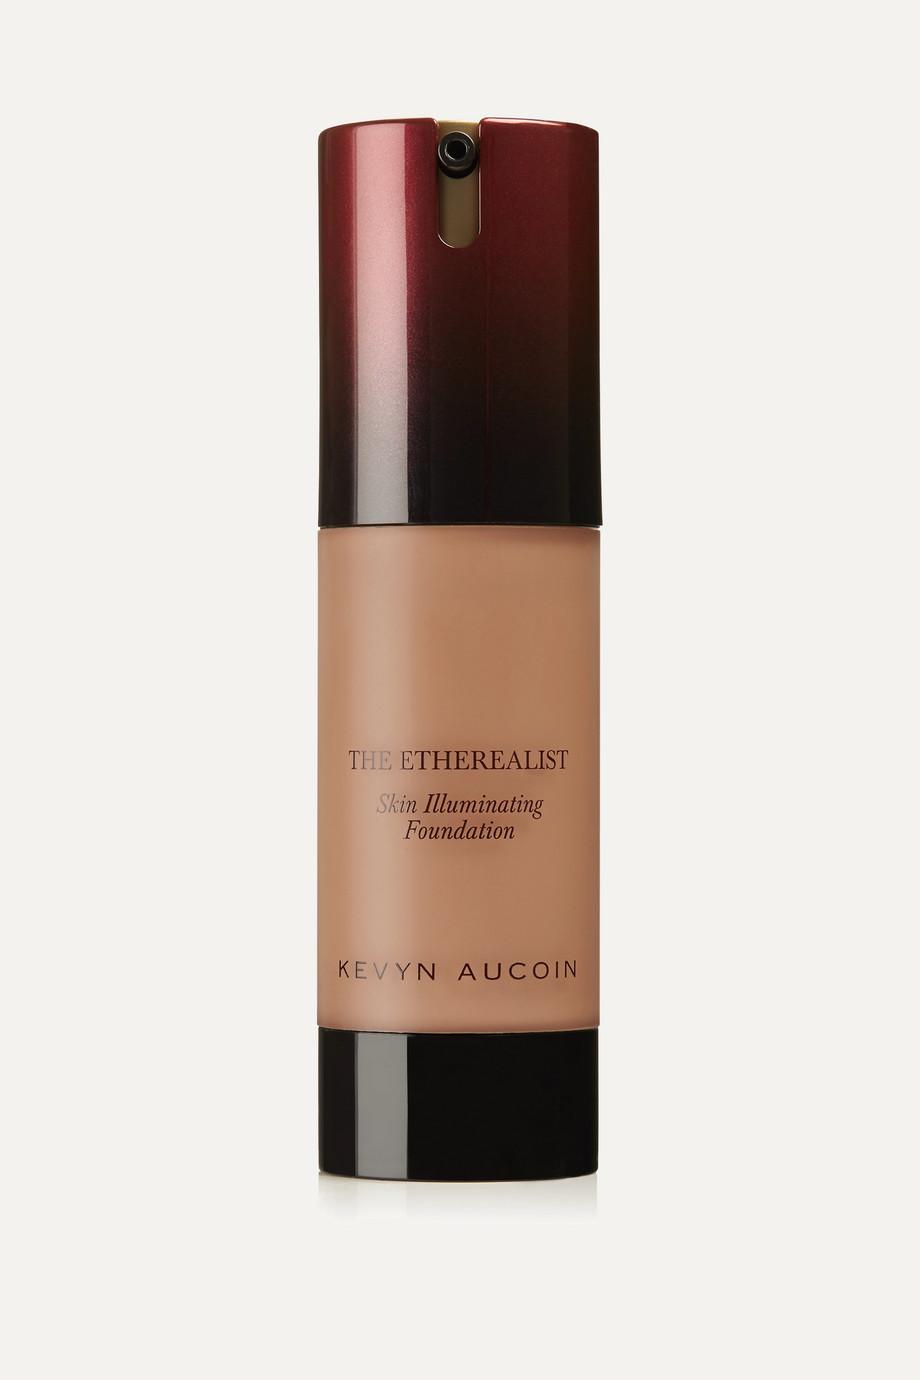 Kevyn Aucoin The Etherealist Skin Illuminating Foundation - Medium EF 10, 28ml